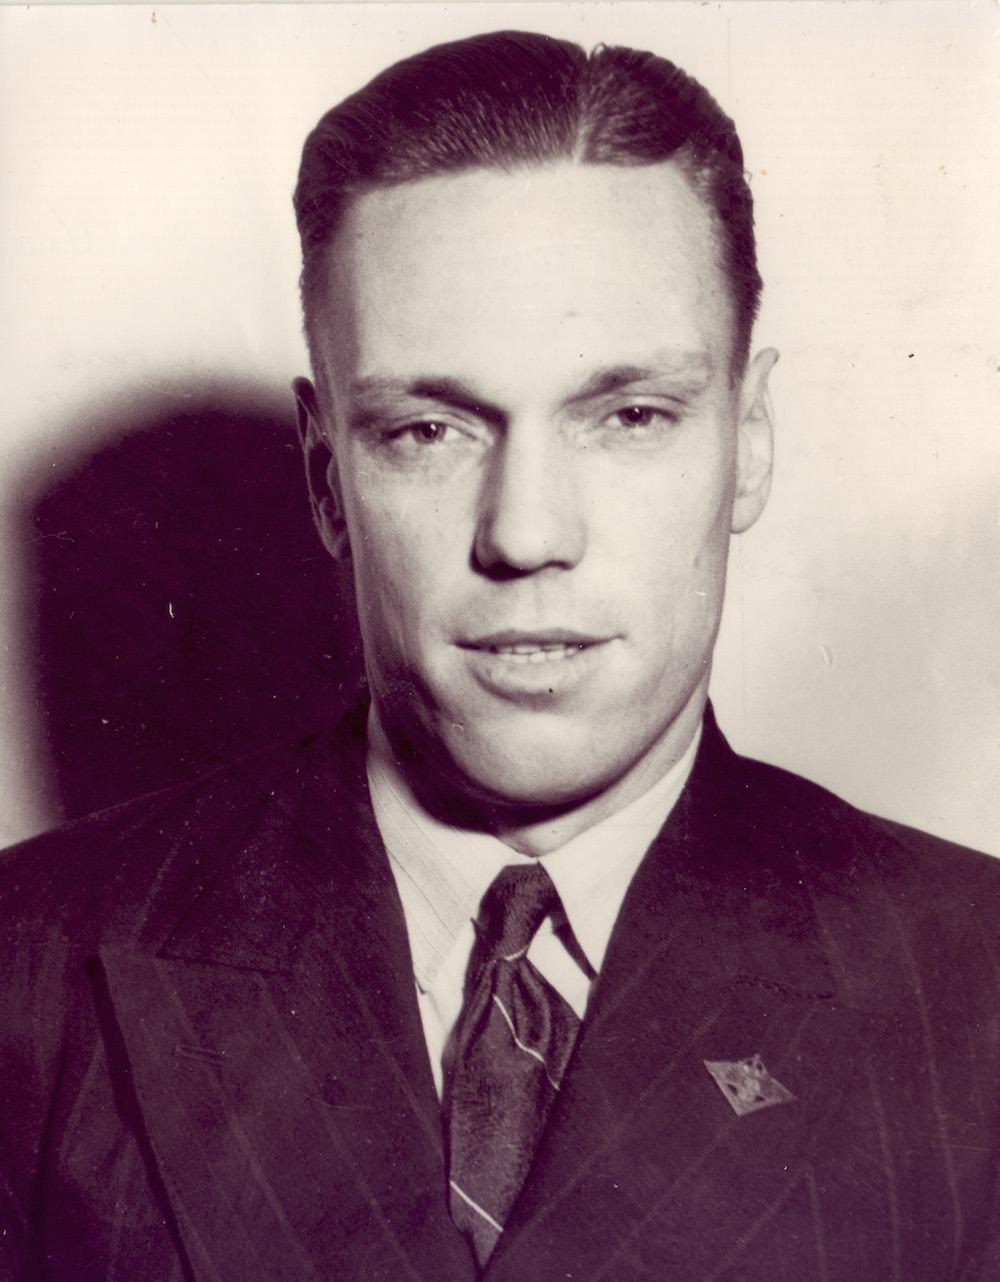 Dick Braithwaite 1947